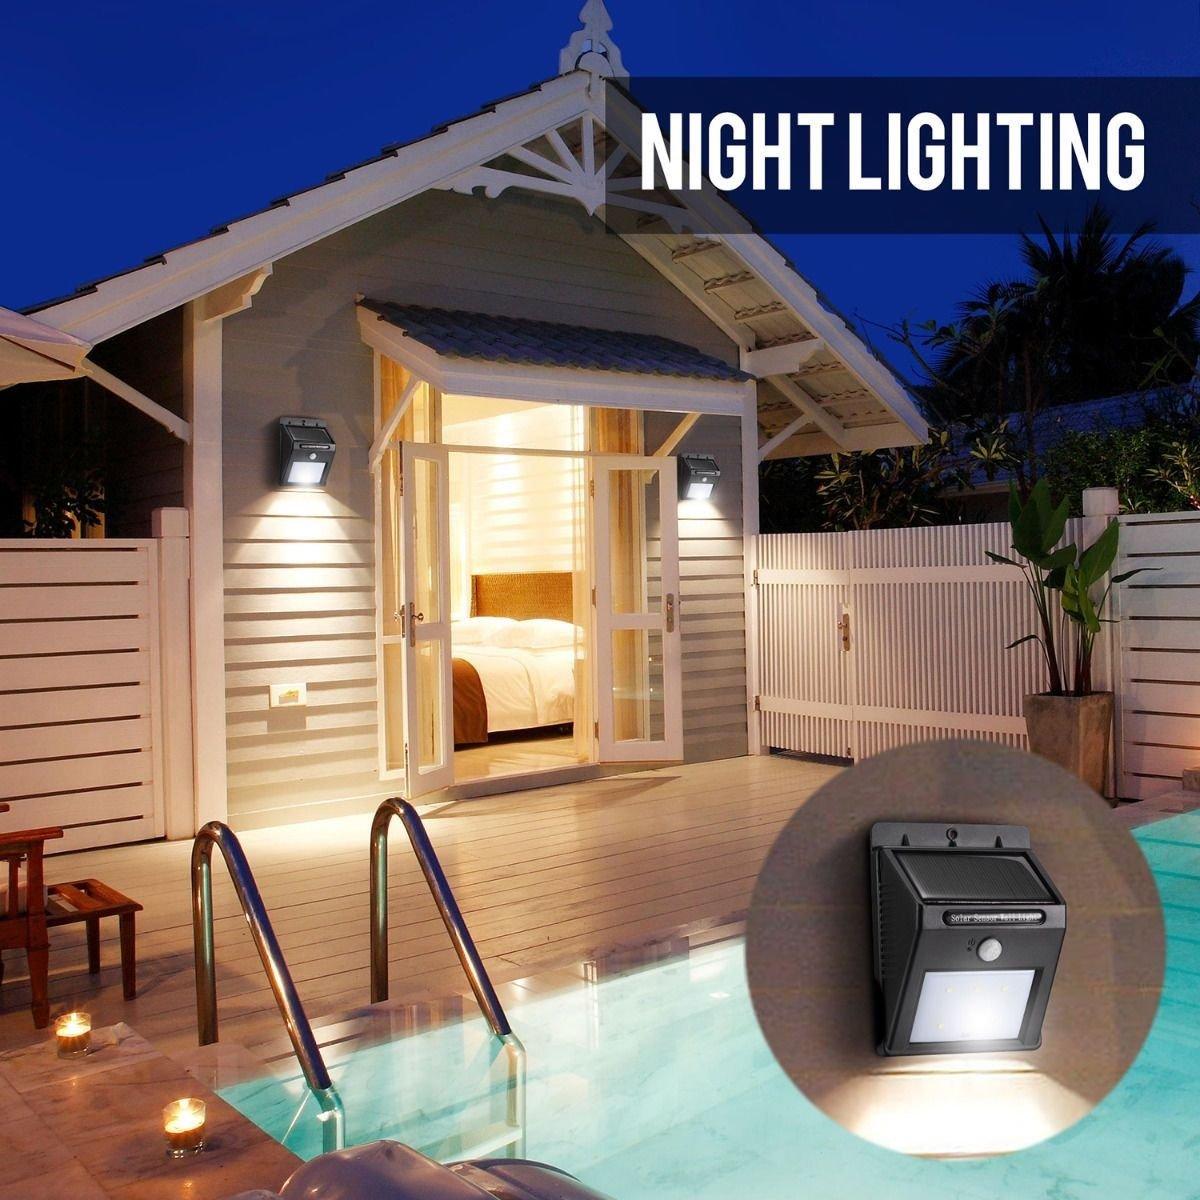 dealetechアウトドア防水ソーラーLEDモーションセンサーライト庭セキュリティ壁ライト B01M69RQ0M